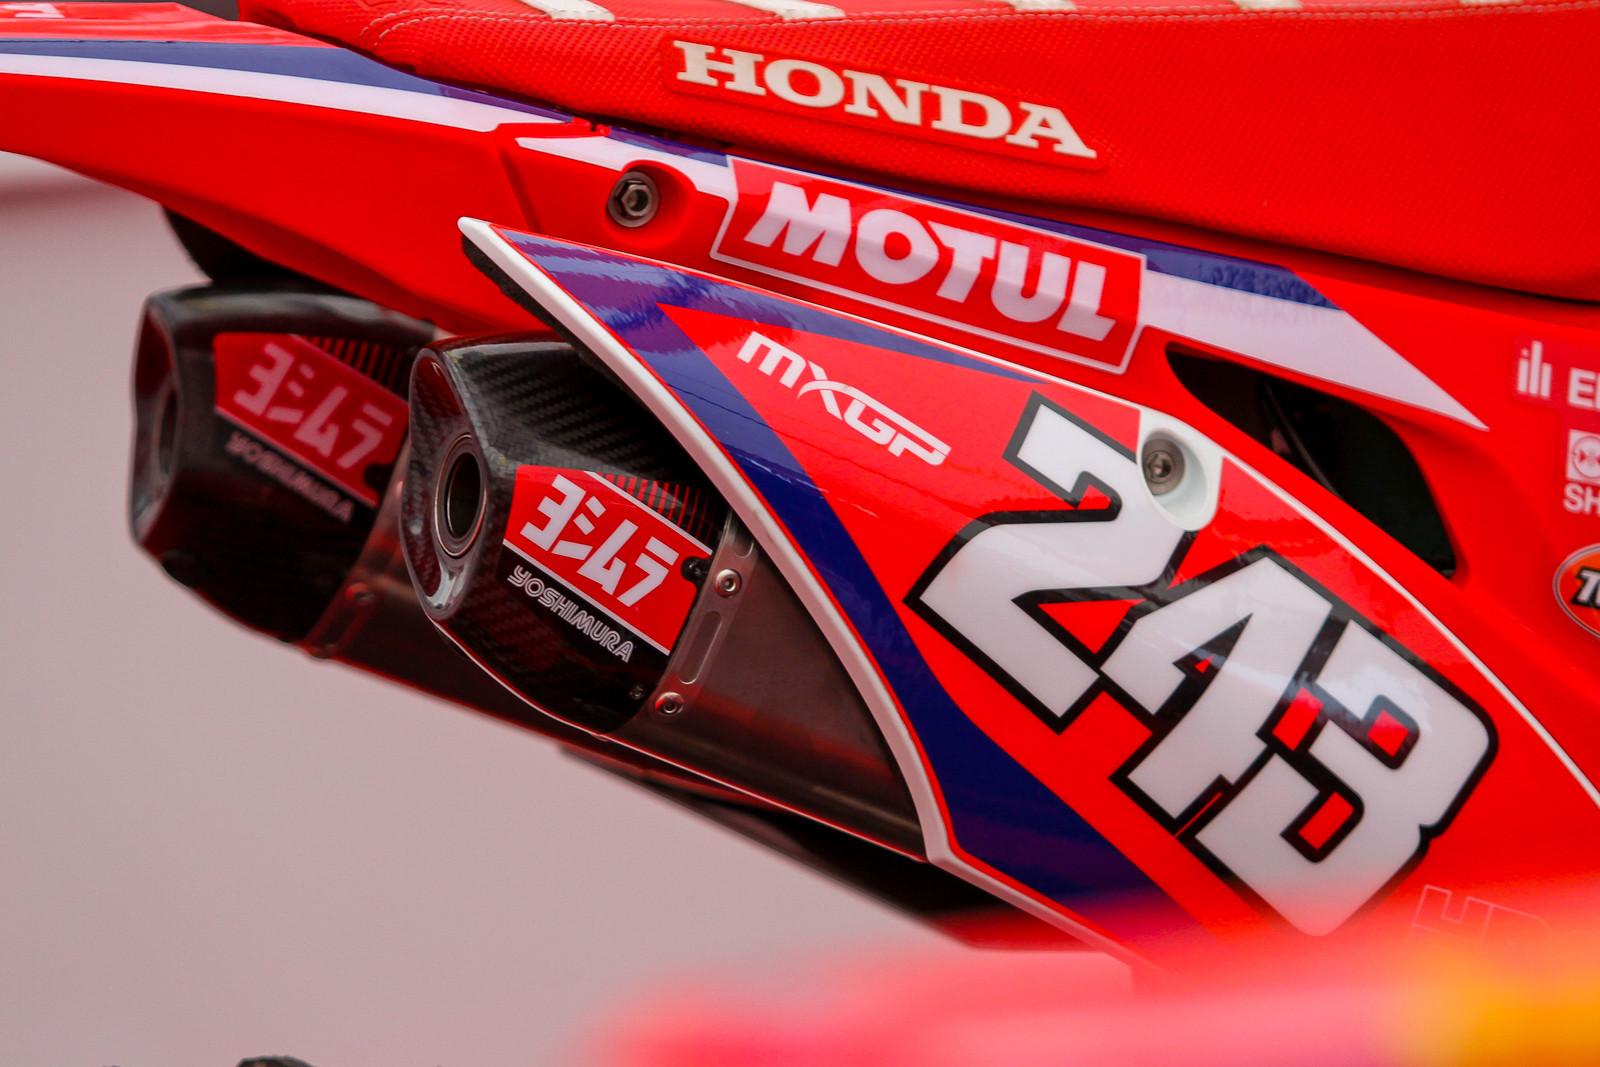 Tim Gajser's Yoshimura Exhaust - Vital MX Pit Bits: 2017 MXGP of Valkenswaard - Motocross Pictures - Vital MX